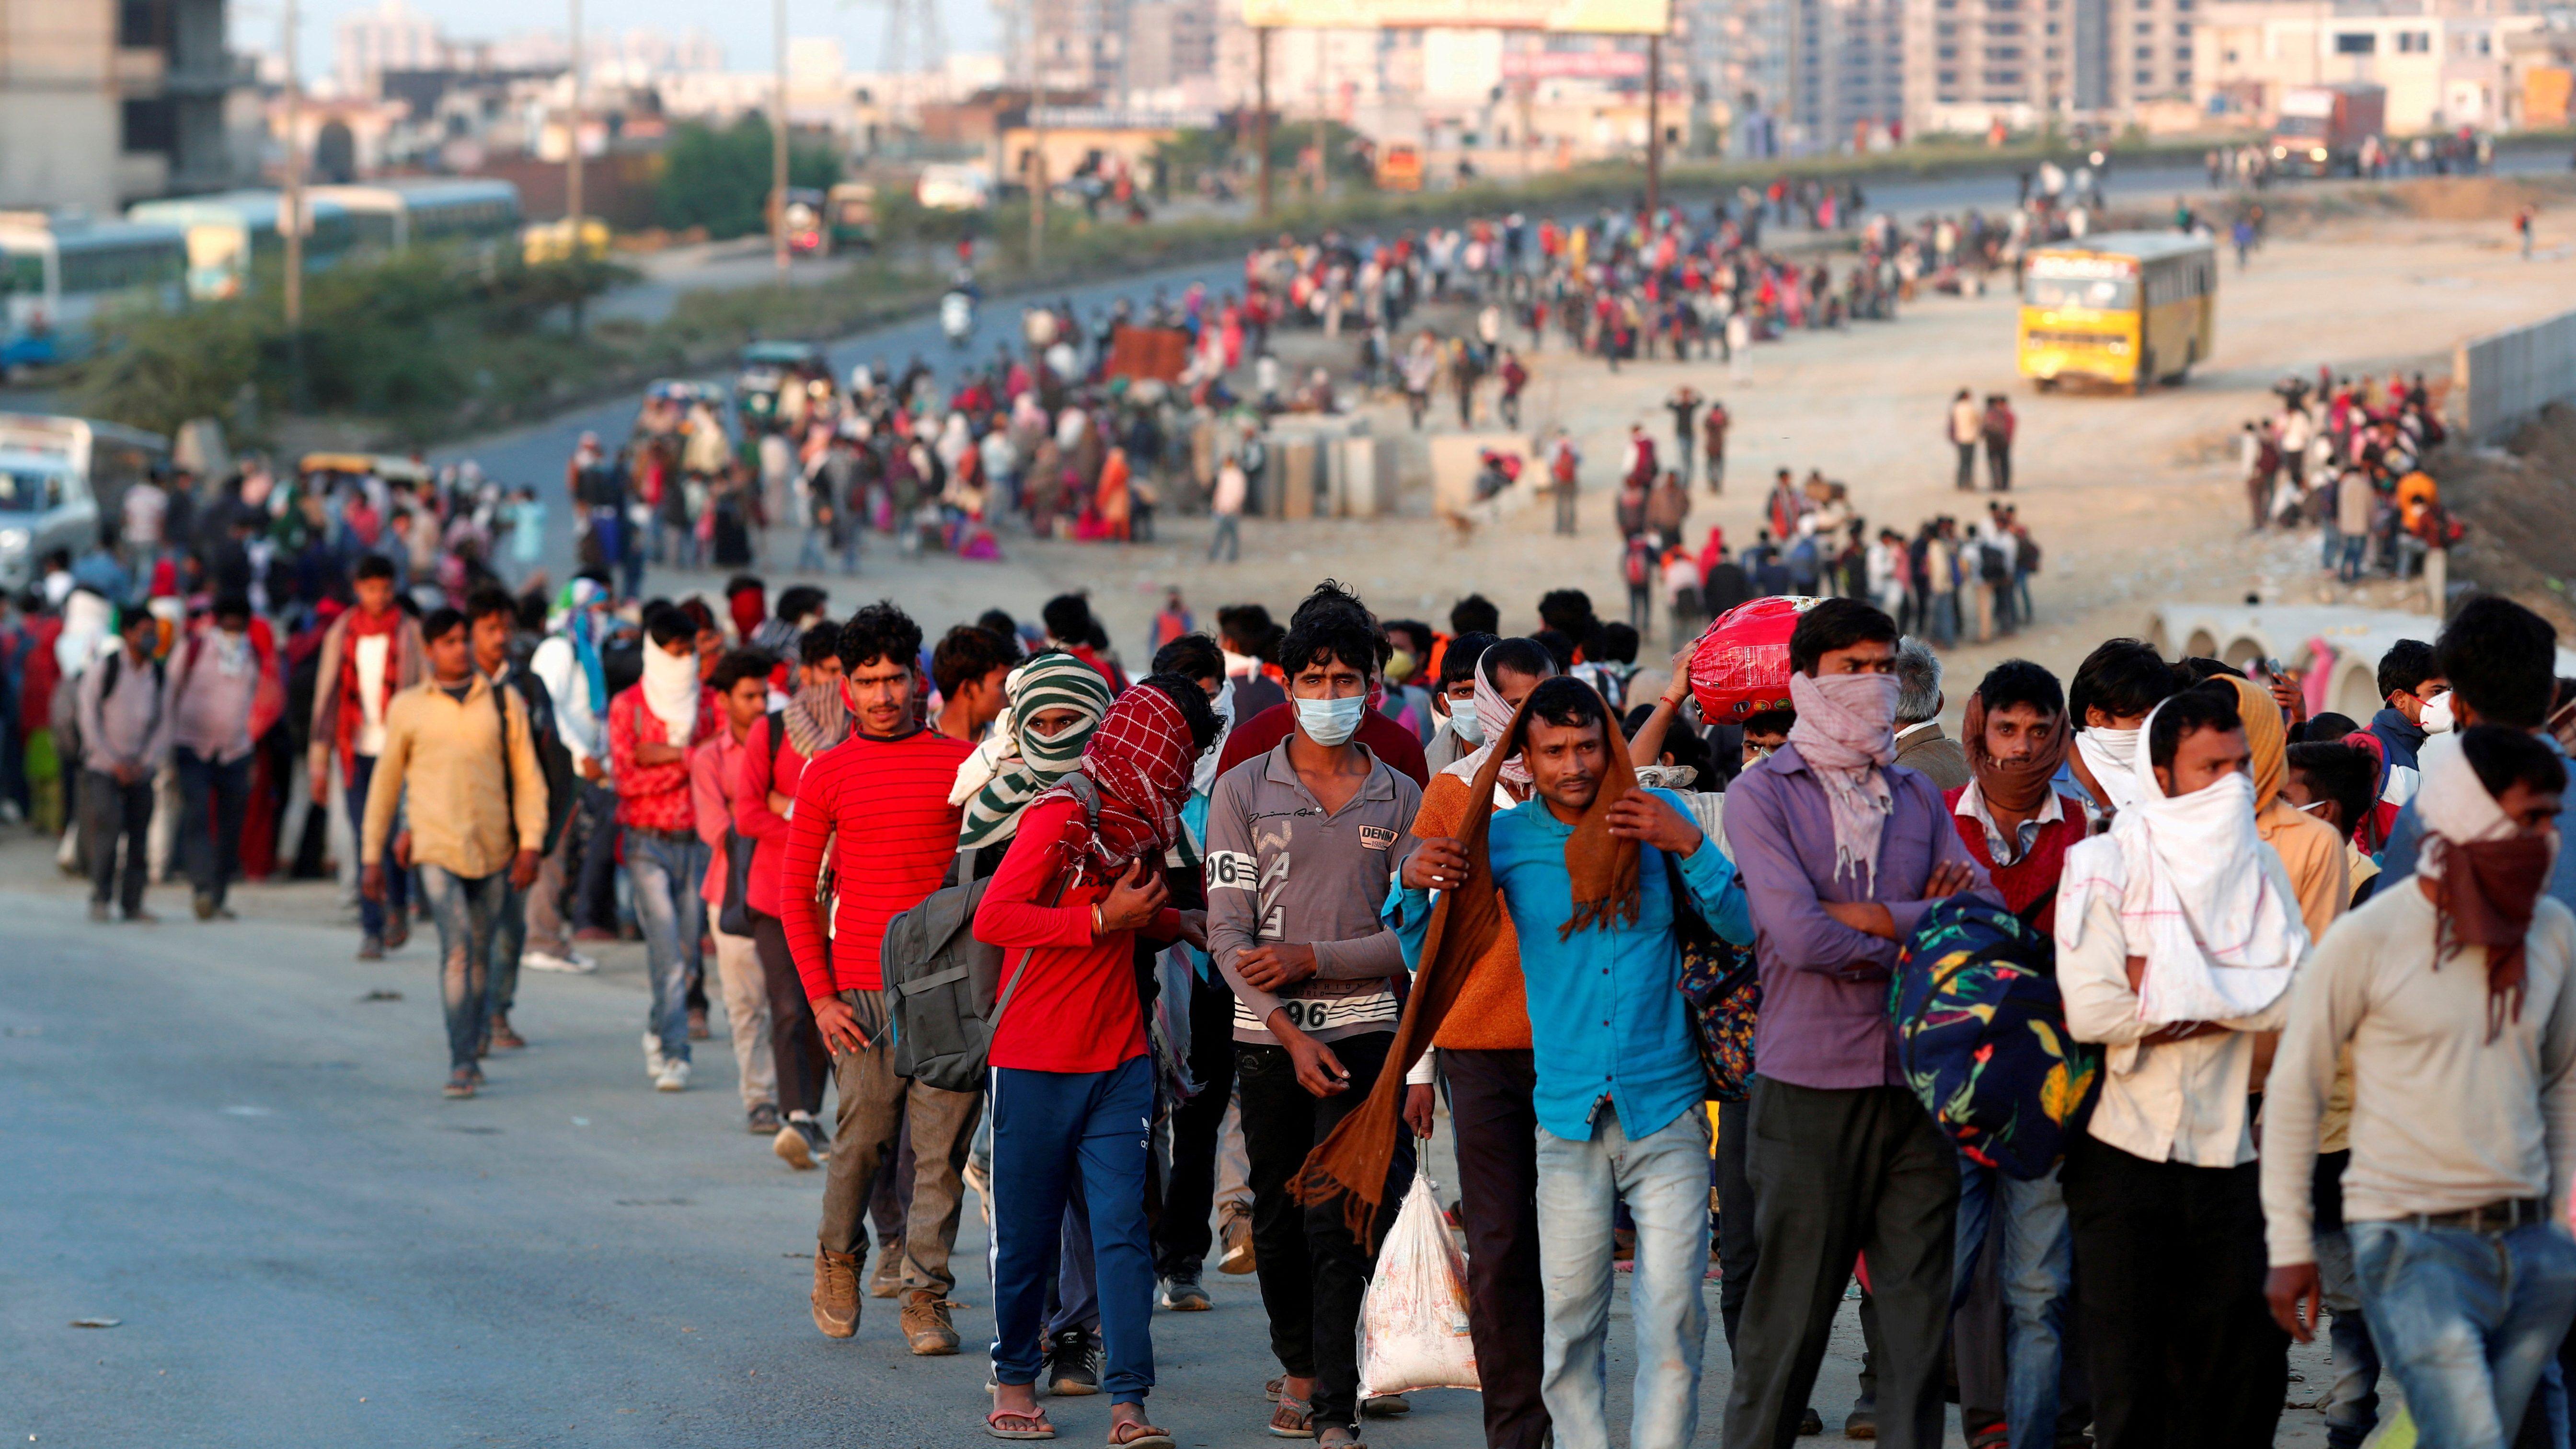 An Indian cloth trader's harrowing, 900 km walk home amid coronavirus lockdown